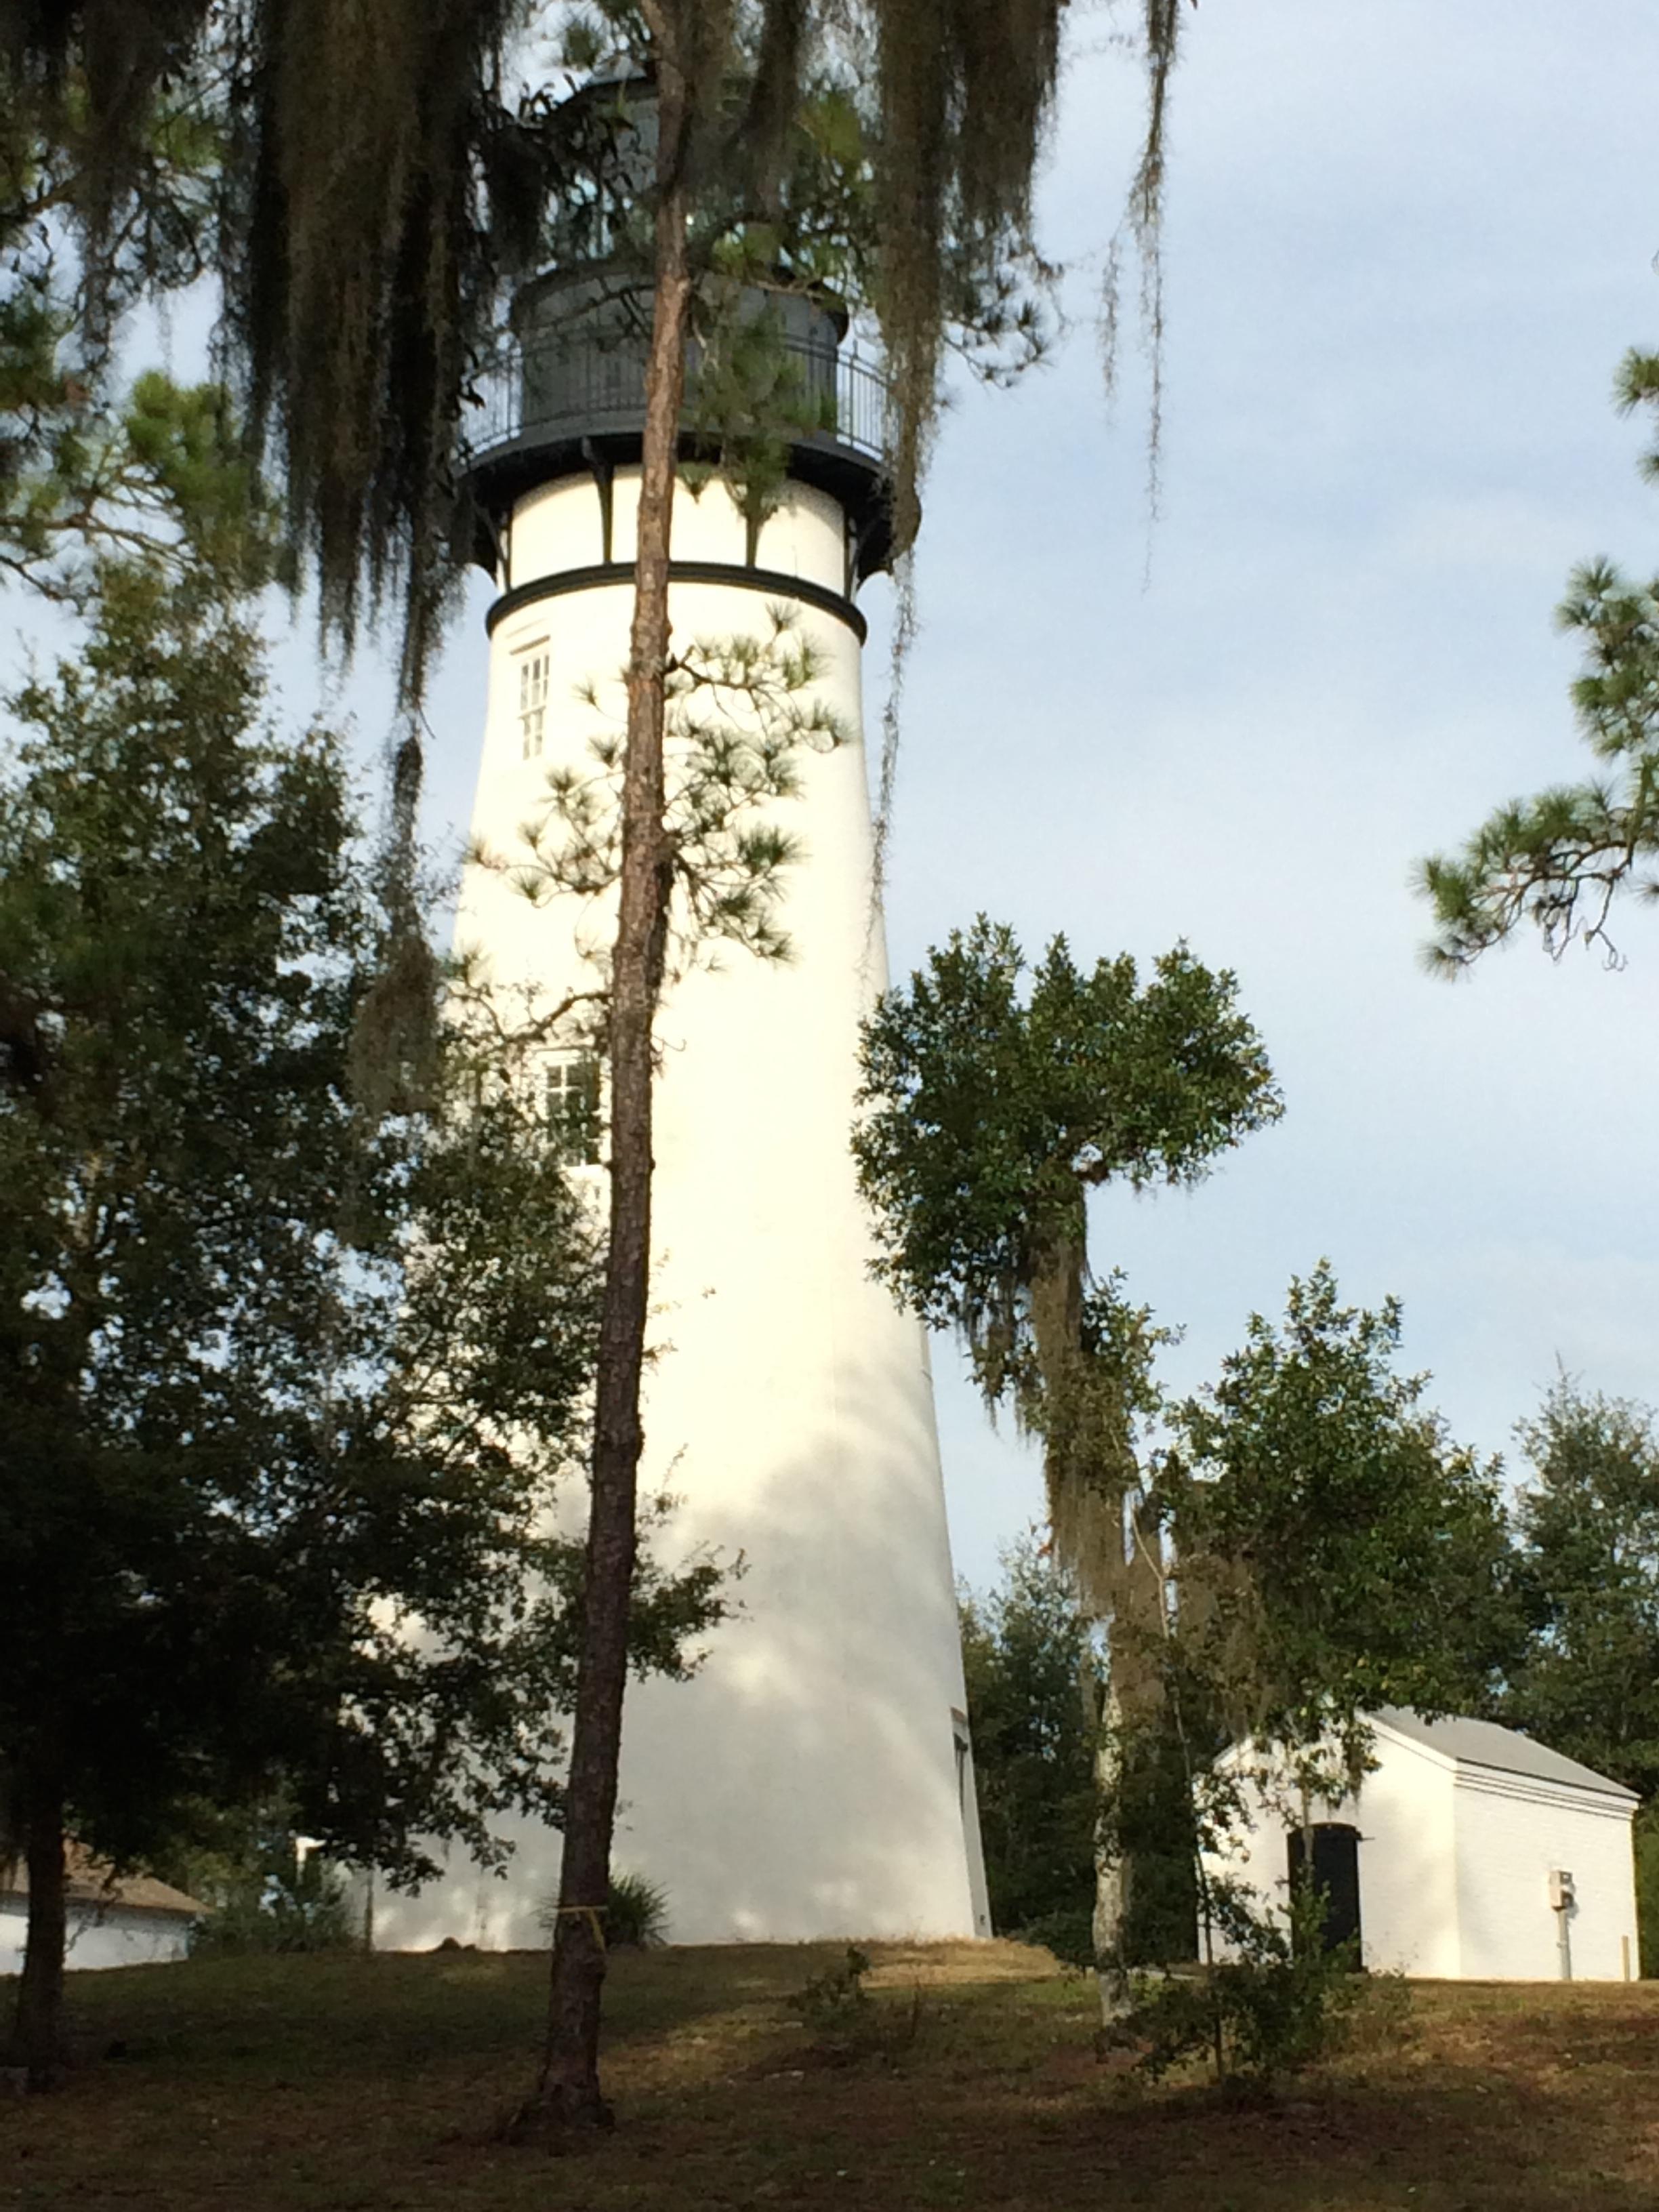 Amelia island christmas tree lighting at amelia island plantation - Our Best Shot Pole And All Of The Amelia Island Light Taken Through A